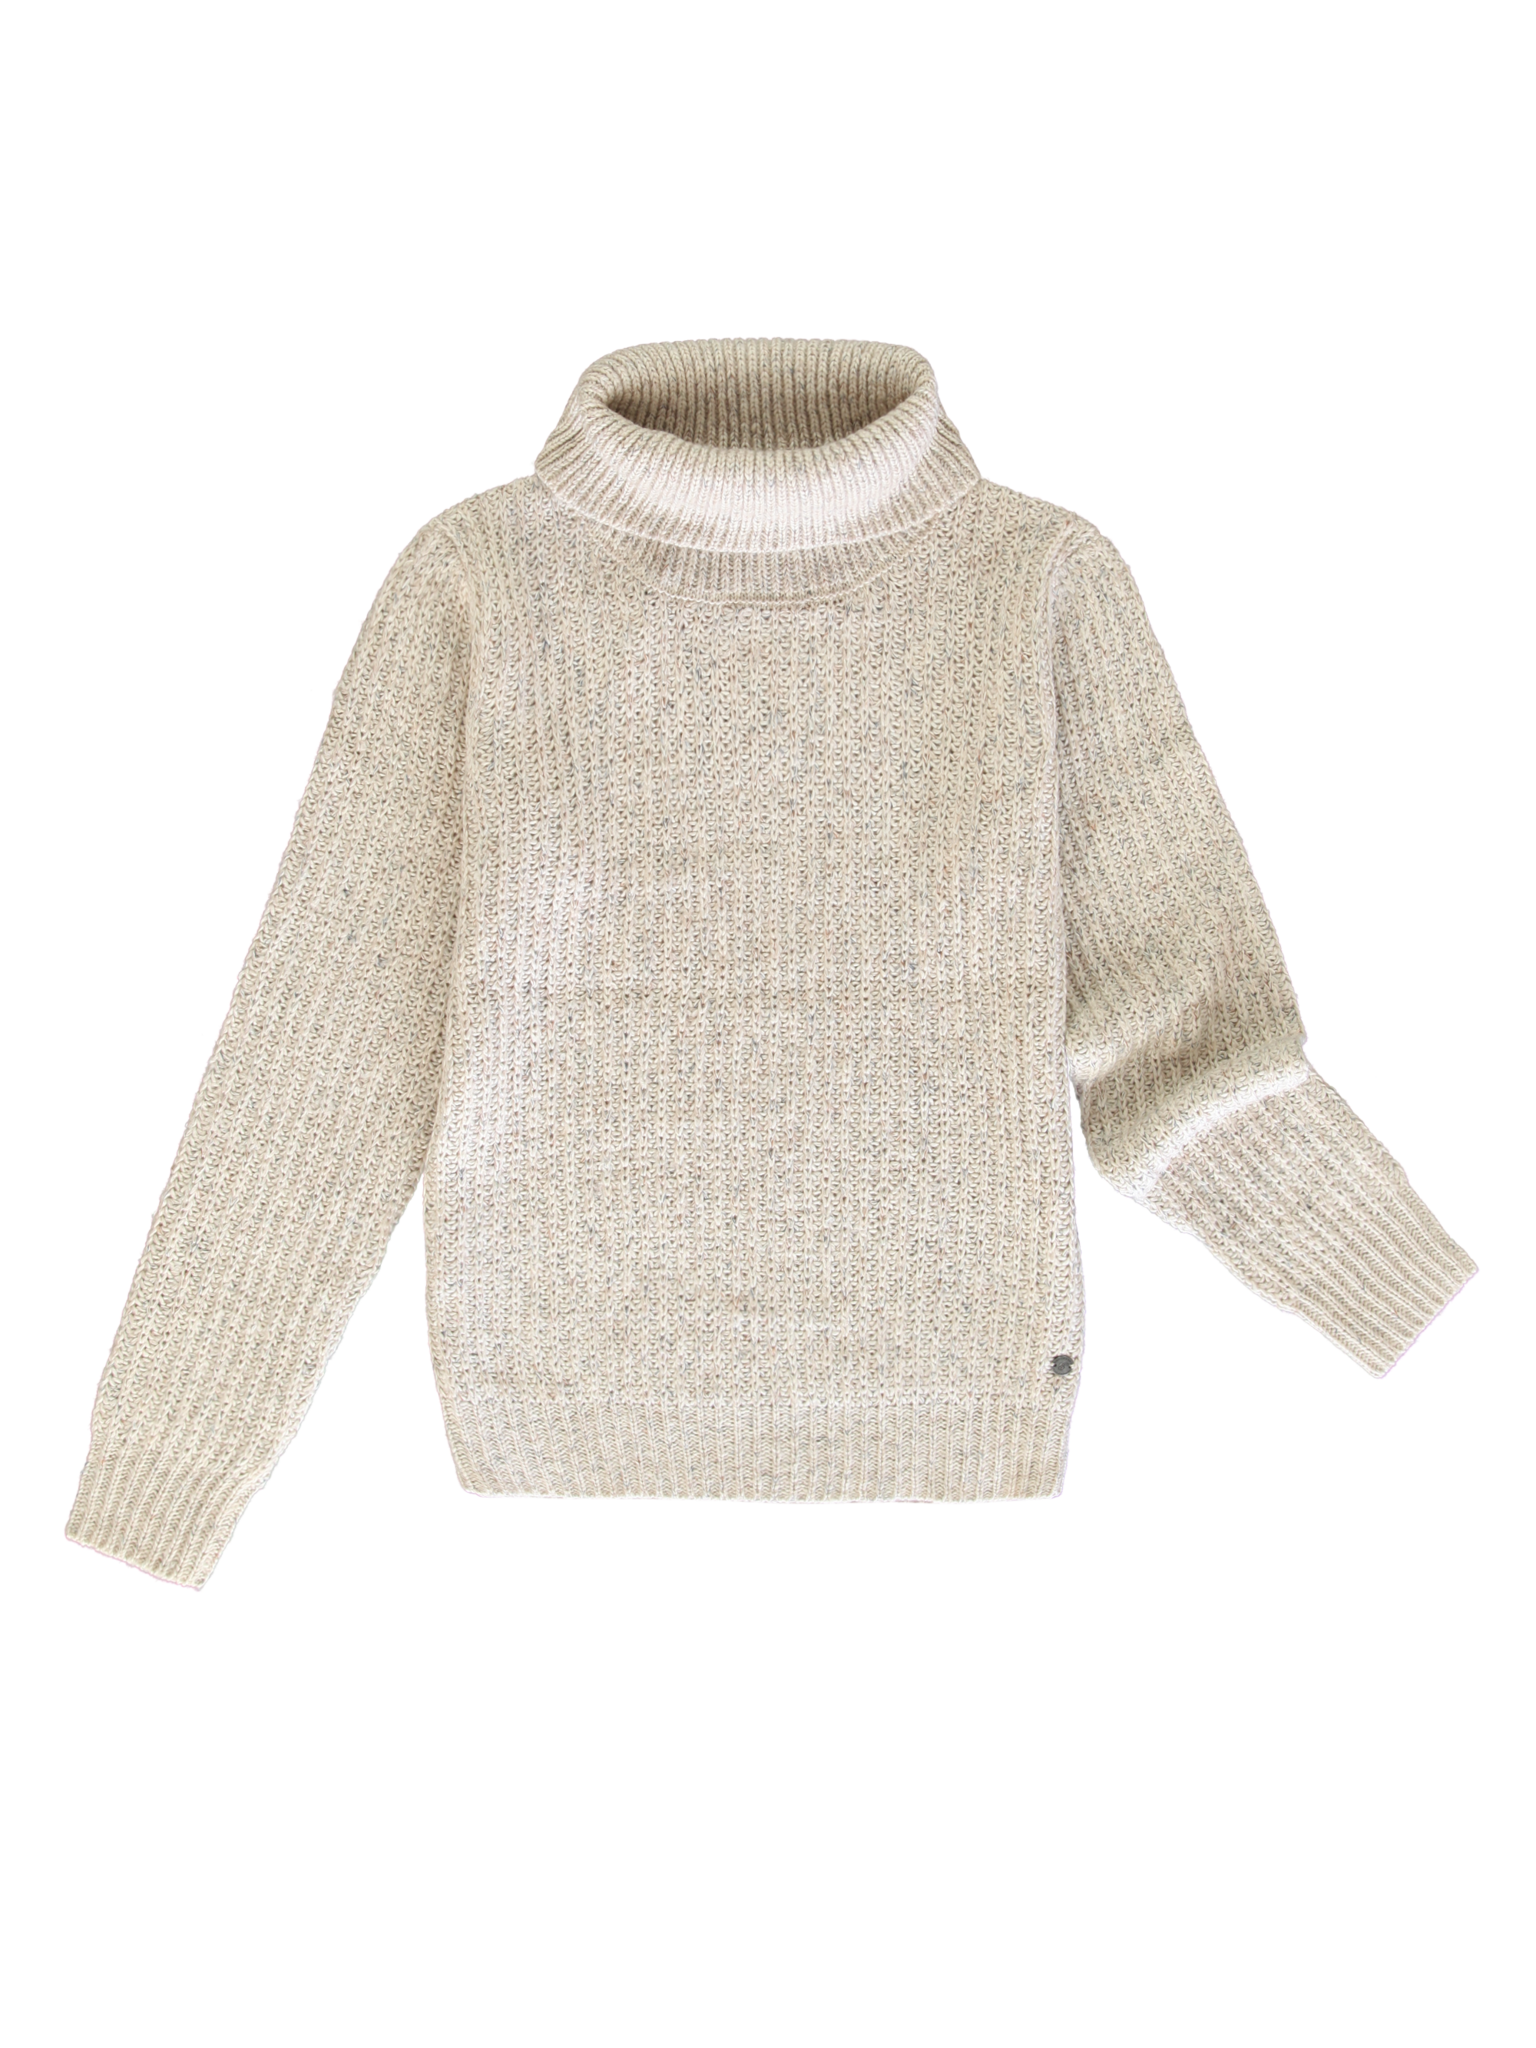 All Brands | Winterproducts Ladies | Pull | 18 pcs/box